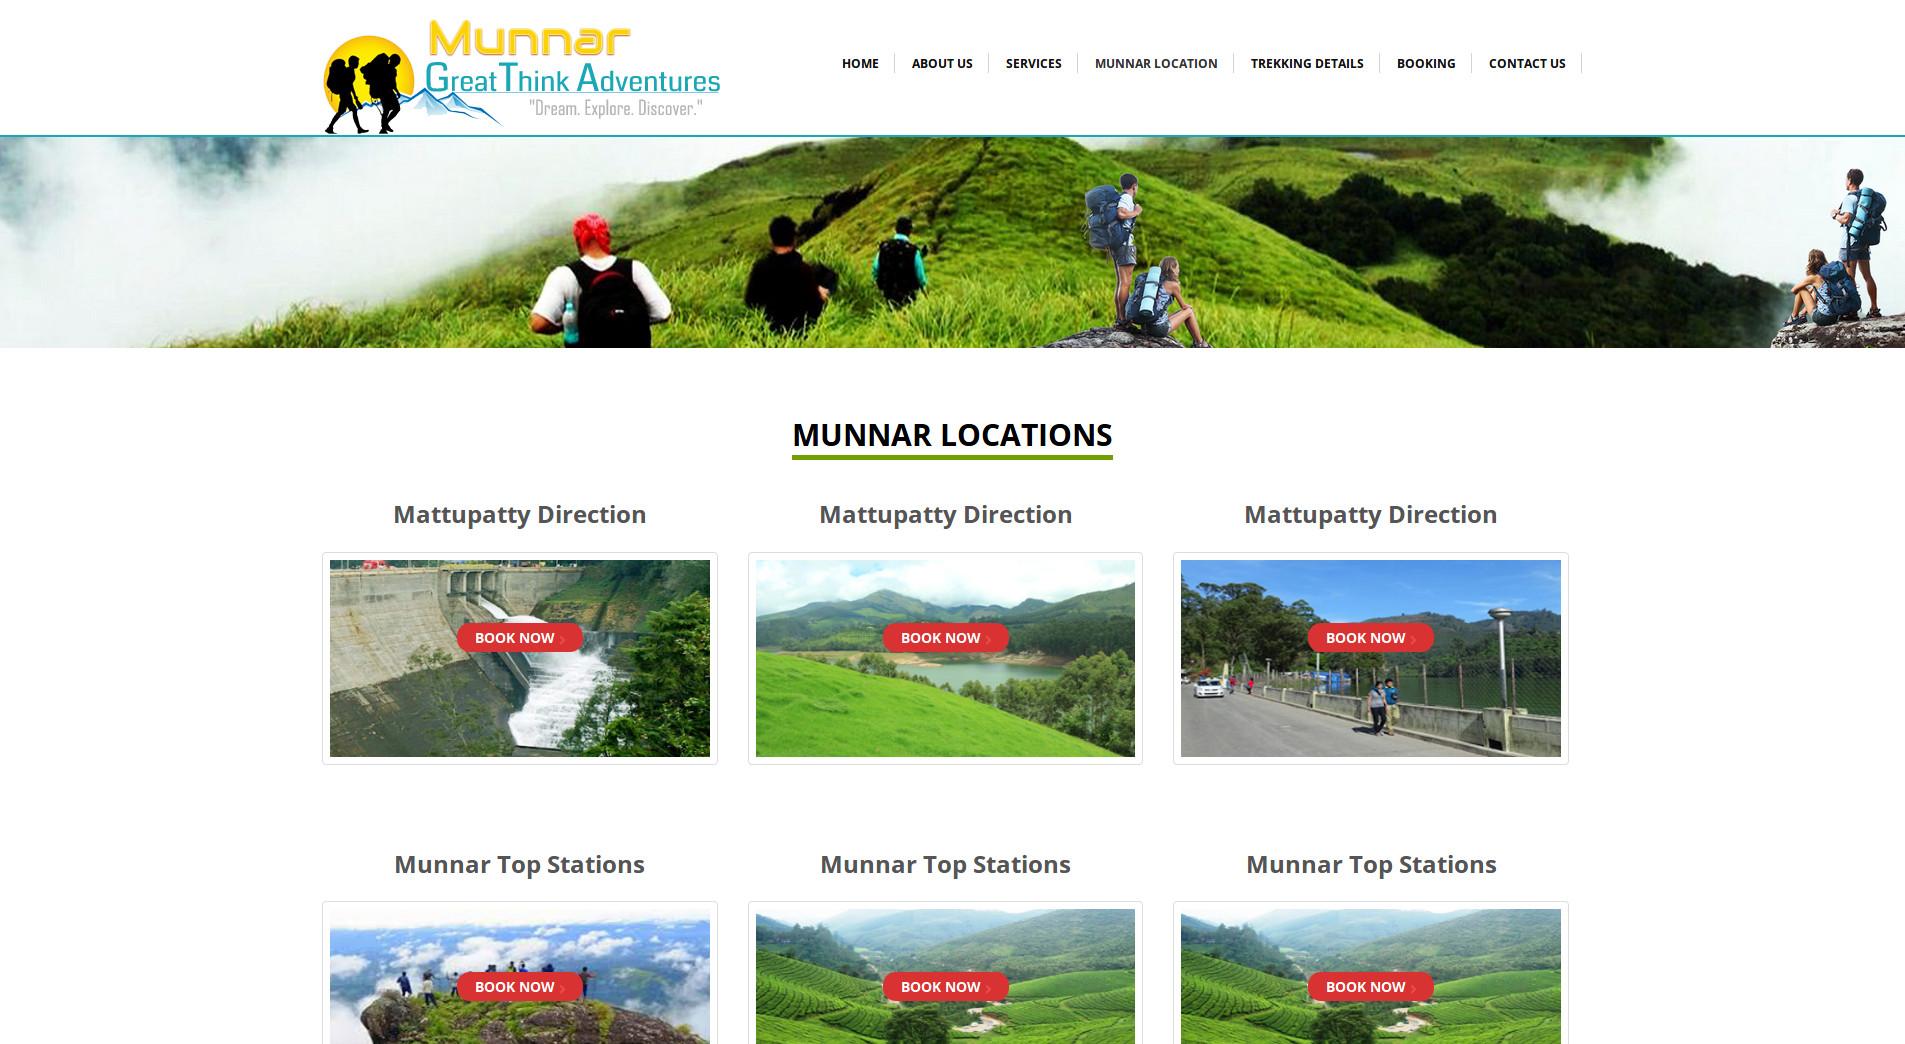 munnar-great-think-adventures